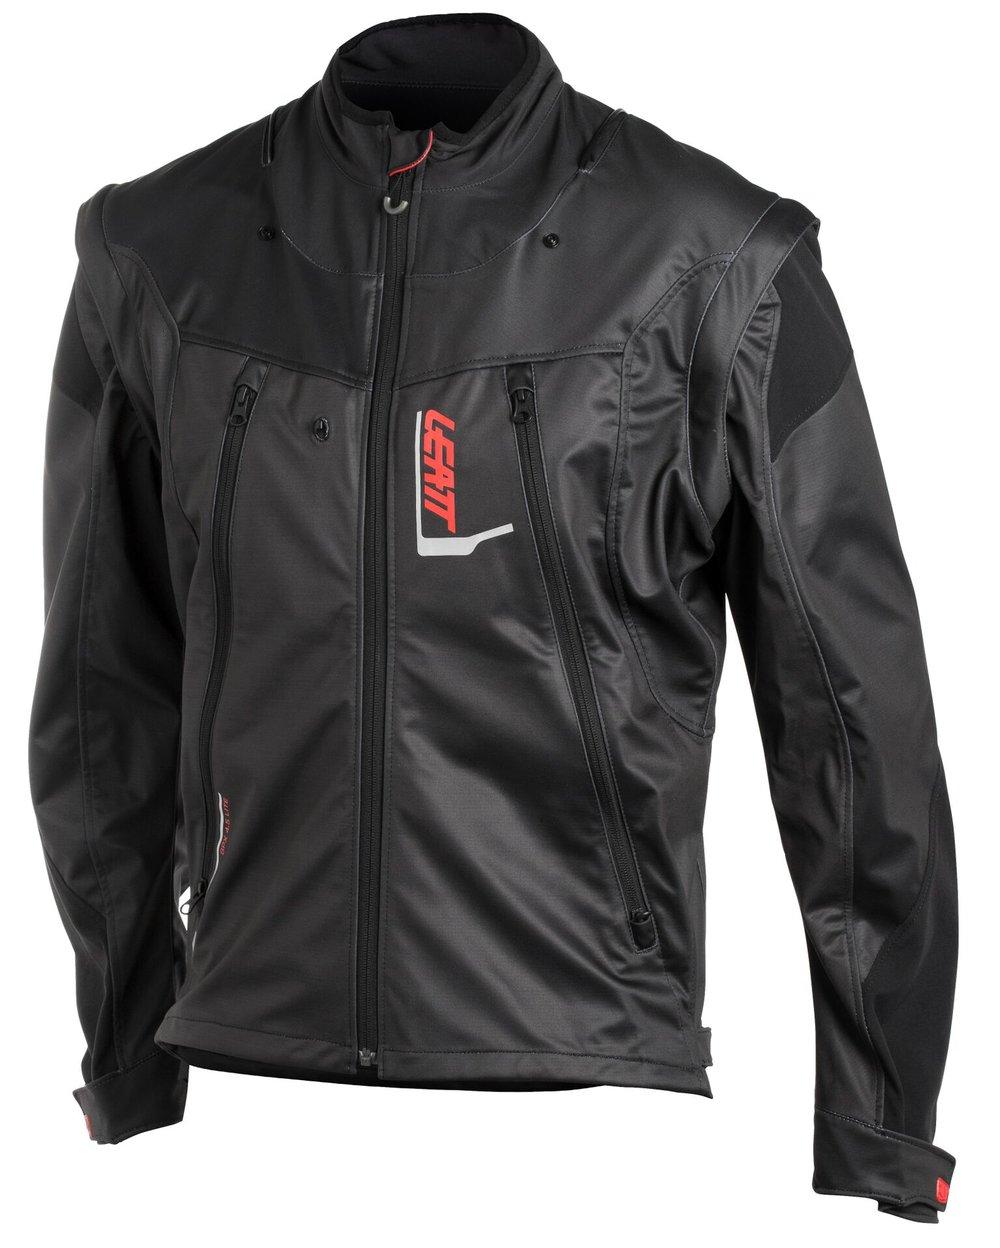 Jacket GPX 4.5 Lite Black Grey 2018_3.JPG